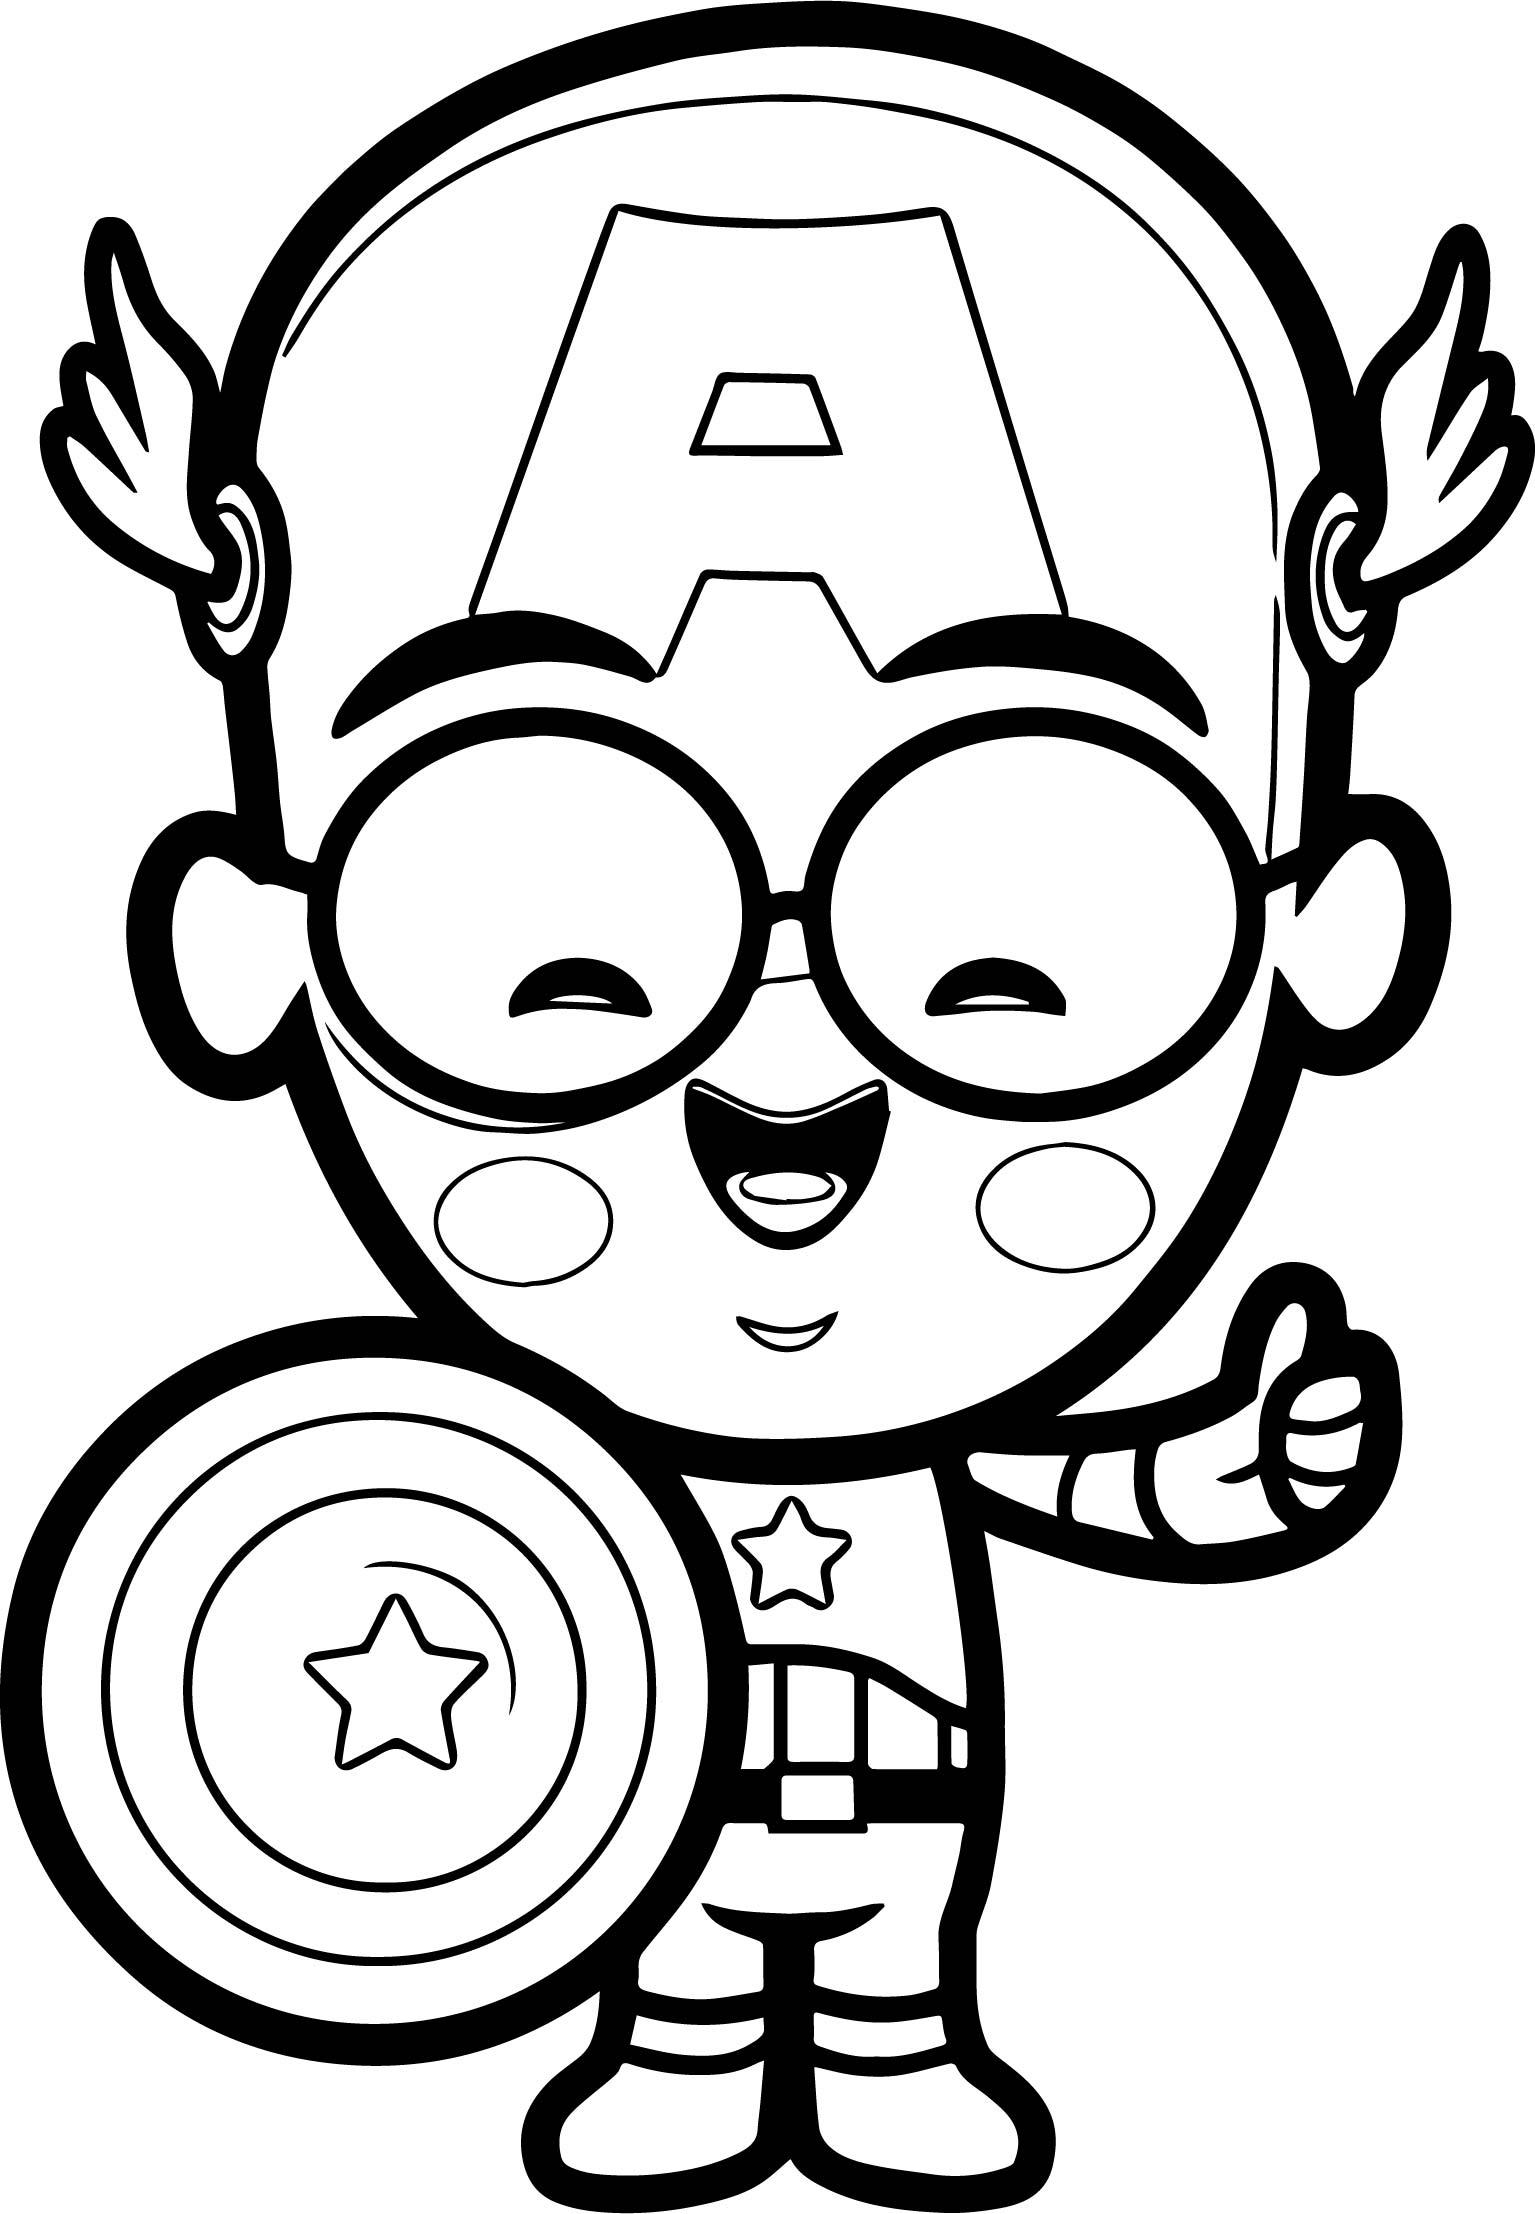 Captain Chibi Smile Coloring Page Wecoloringpage Com